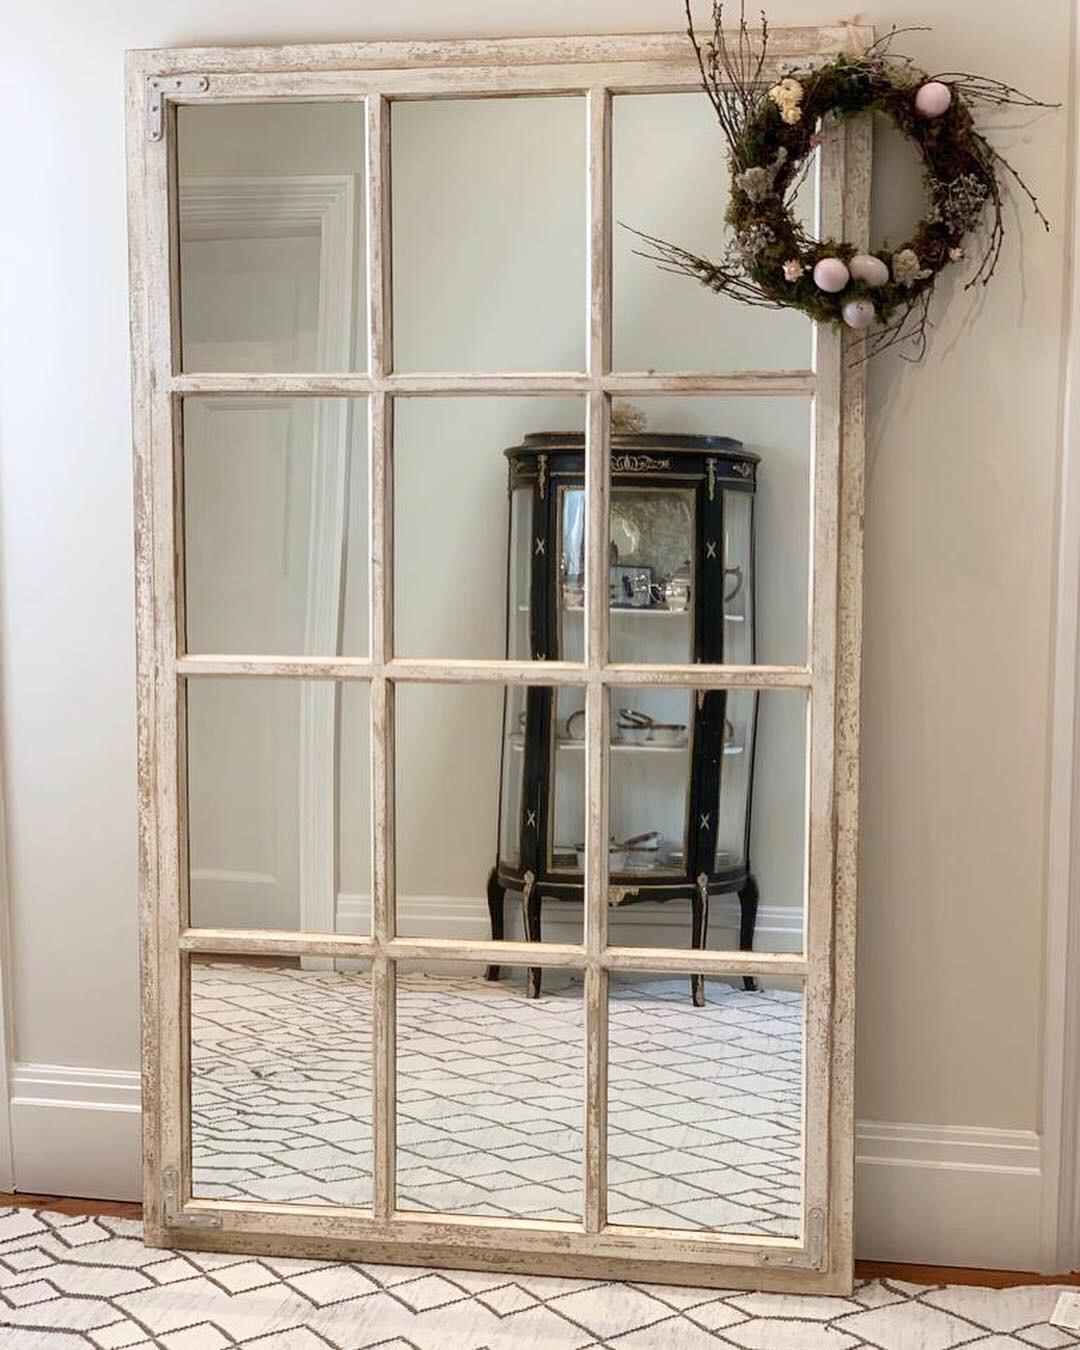 Ella Window Mirror – Cream Distressed In Window Cream Wood Wall Mirrors (Image 10 of 20)